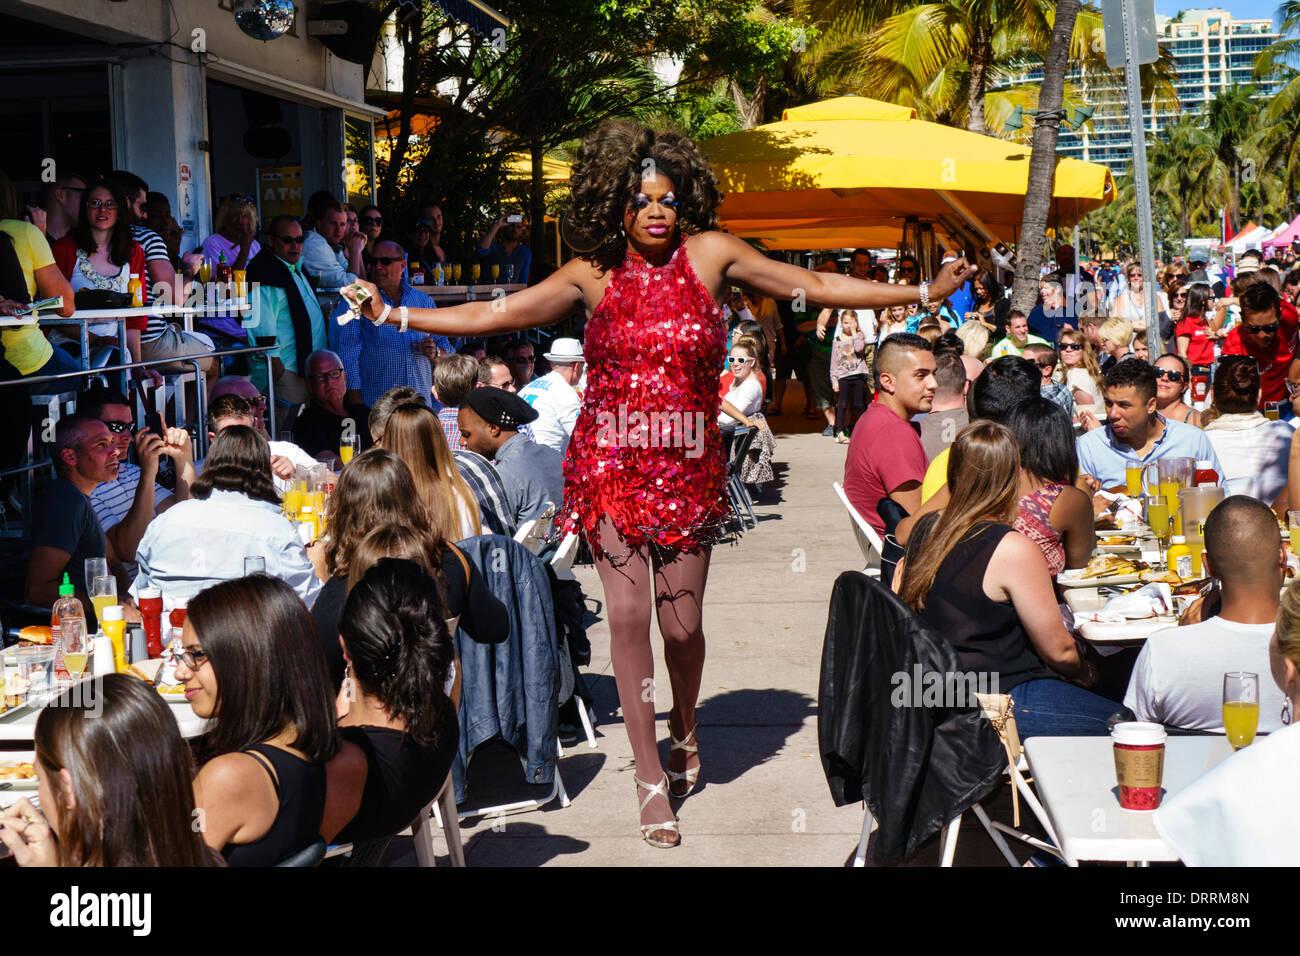 Miami Beach Florida Ocean Drive Art-Deco-Wochenende Festival fair Straßenevent Palace Bar Restaurant im Freien essen live vergnüg Stockbild